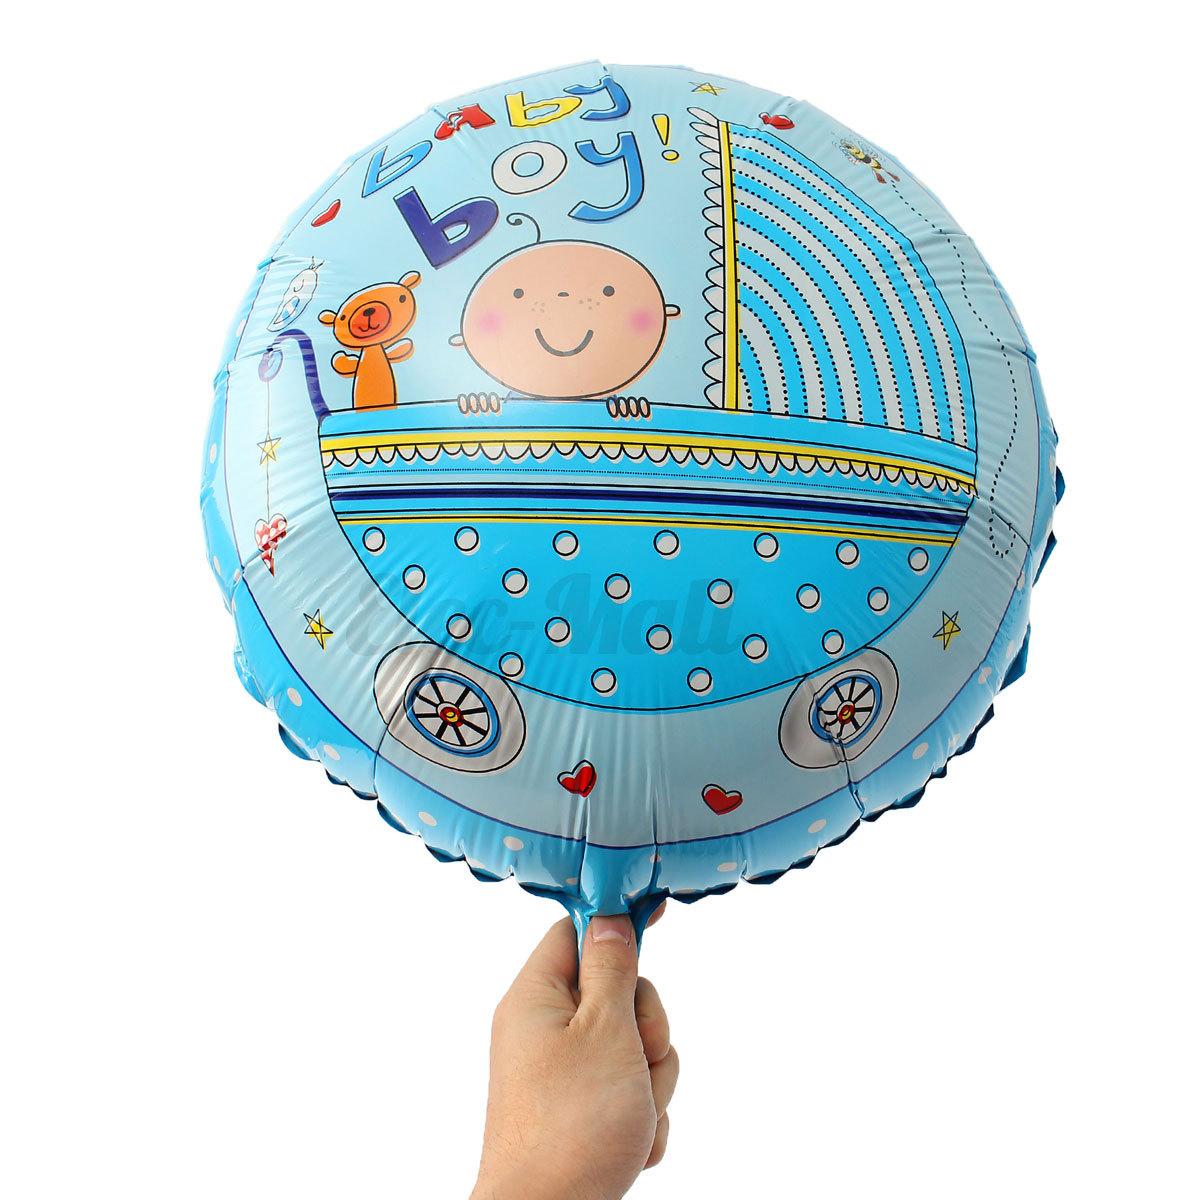 Helium Balloons Baby Shower: 18'' Aluminum Foil Balloon Helium Balloons Baby Shower